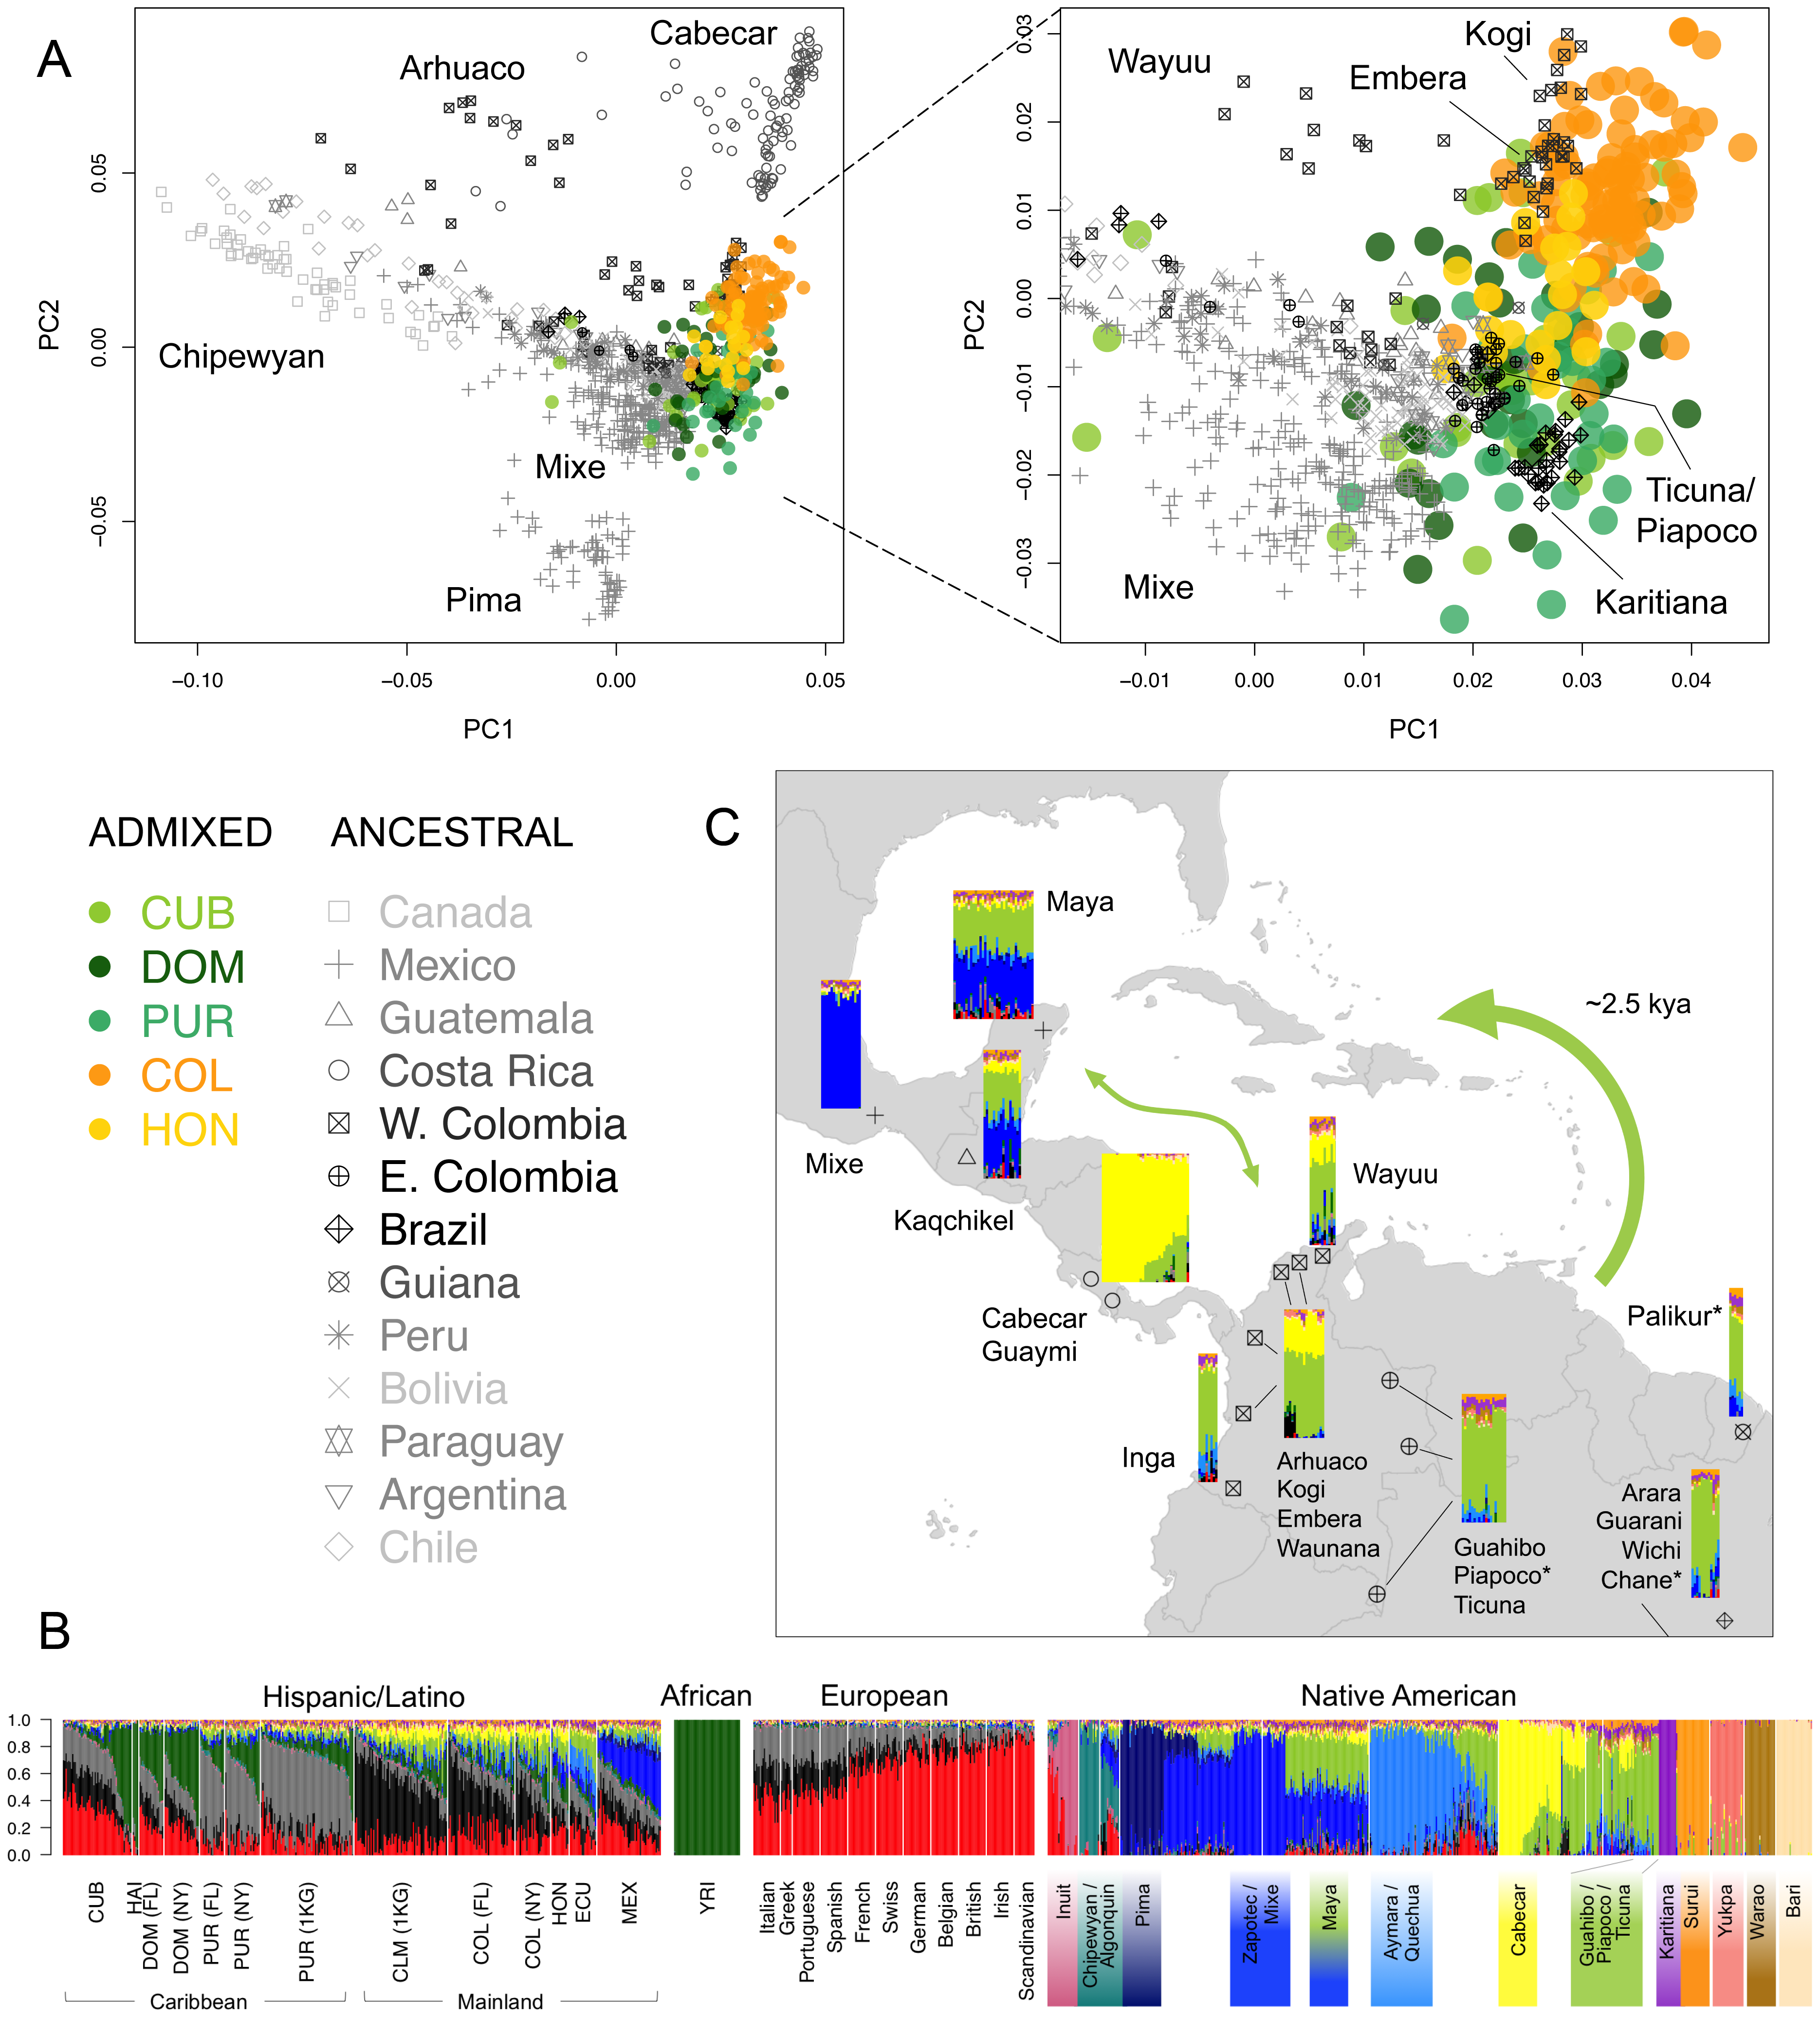 Sub-continental origin of Native American components in the Caribbean.